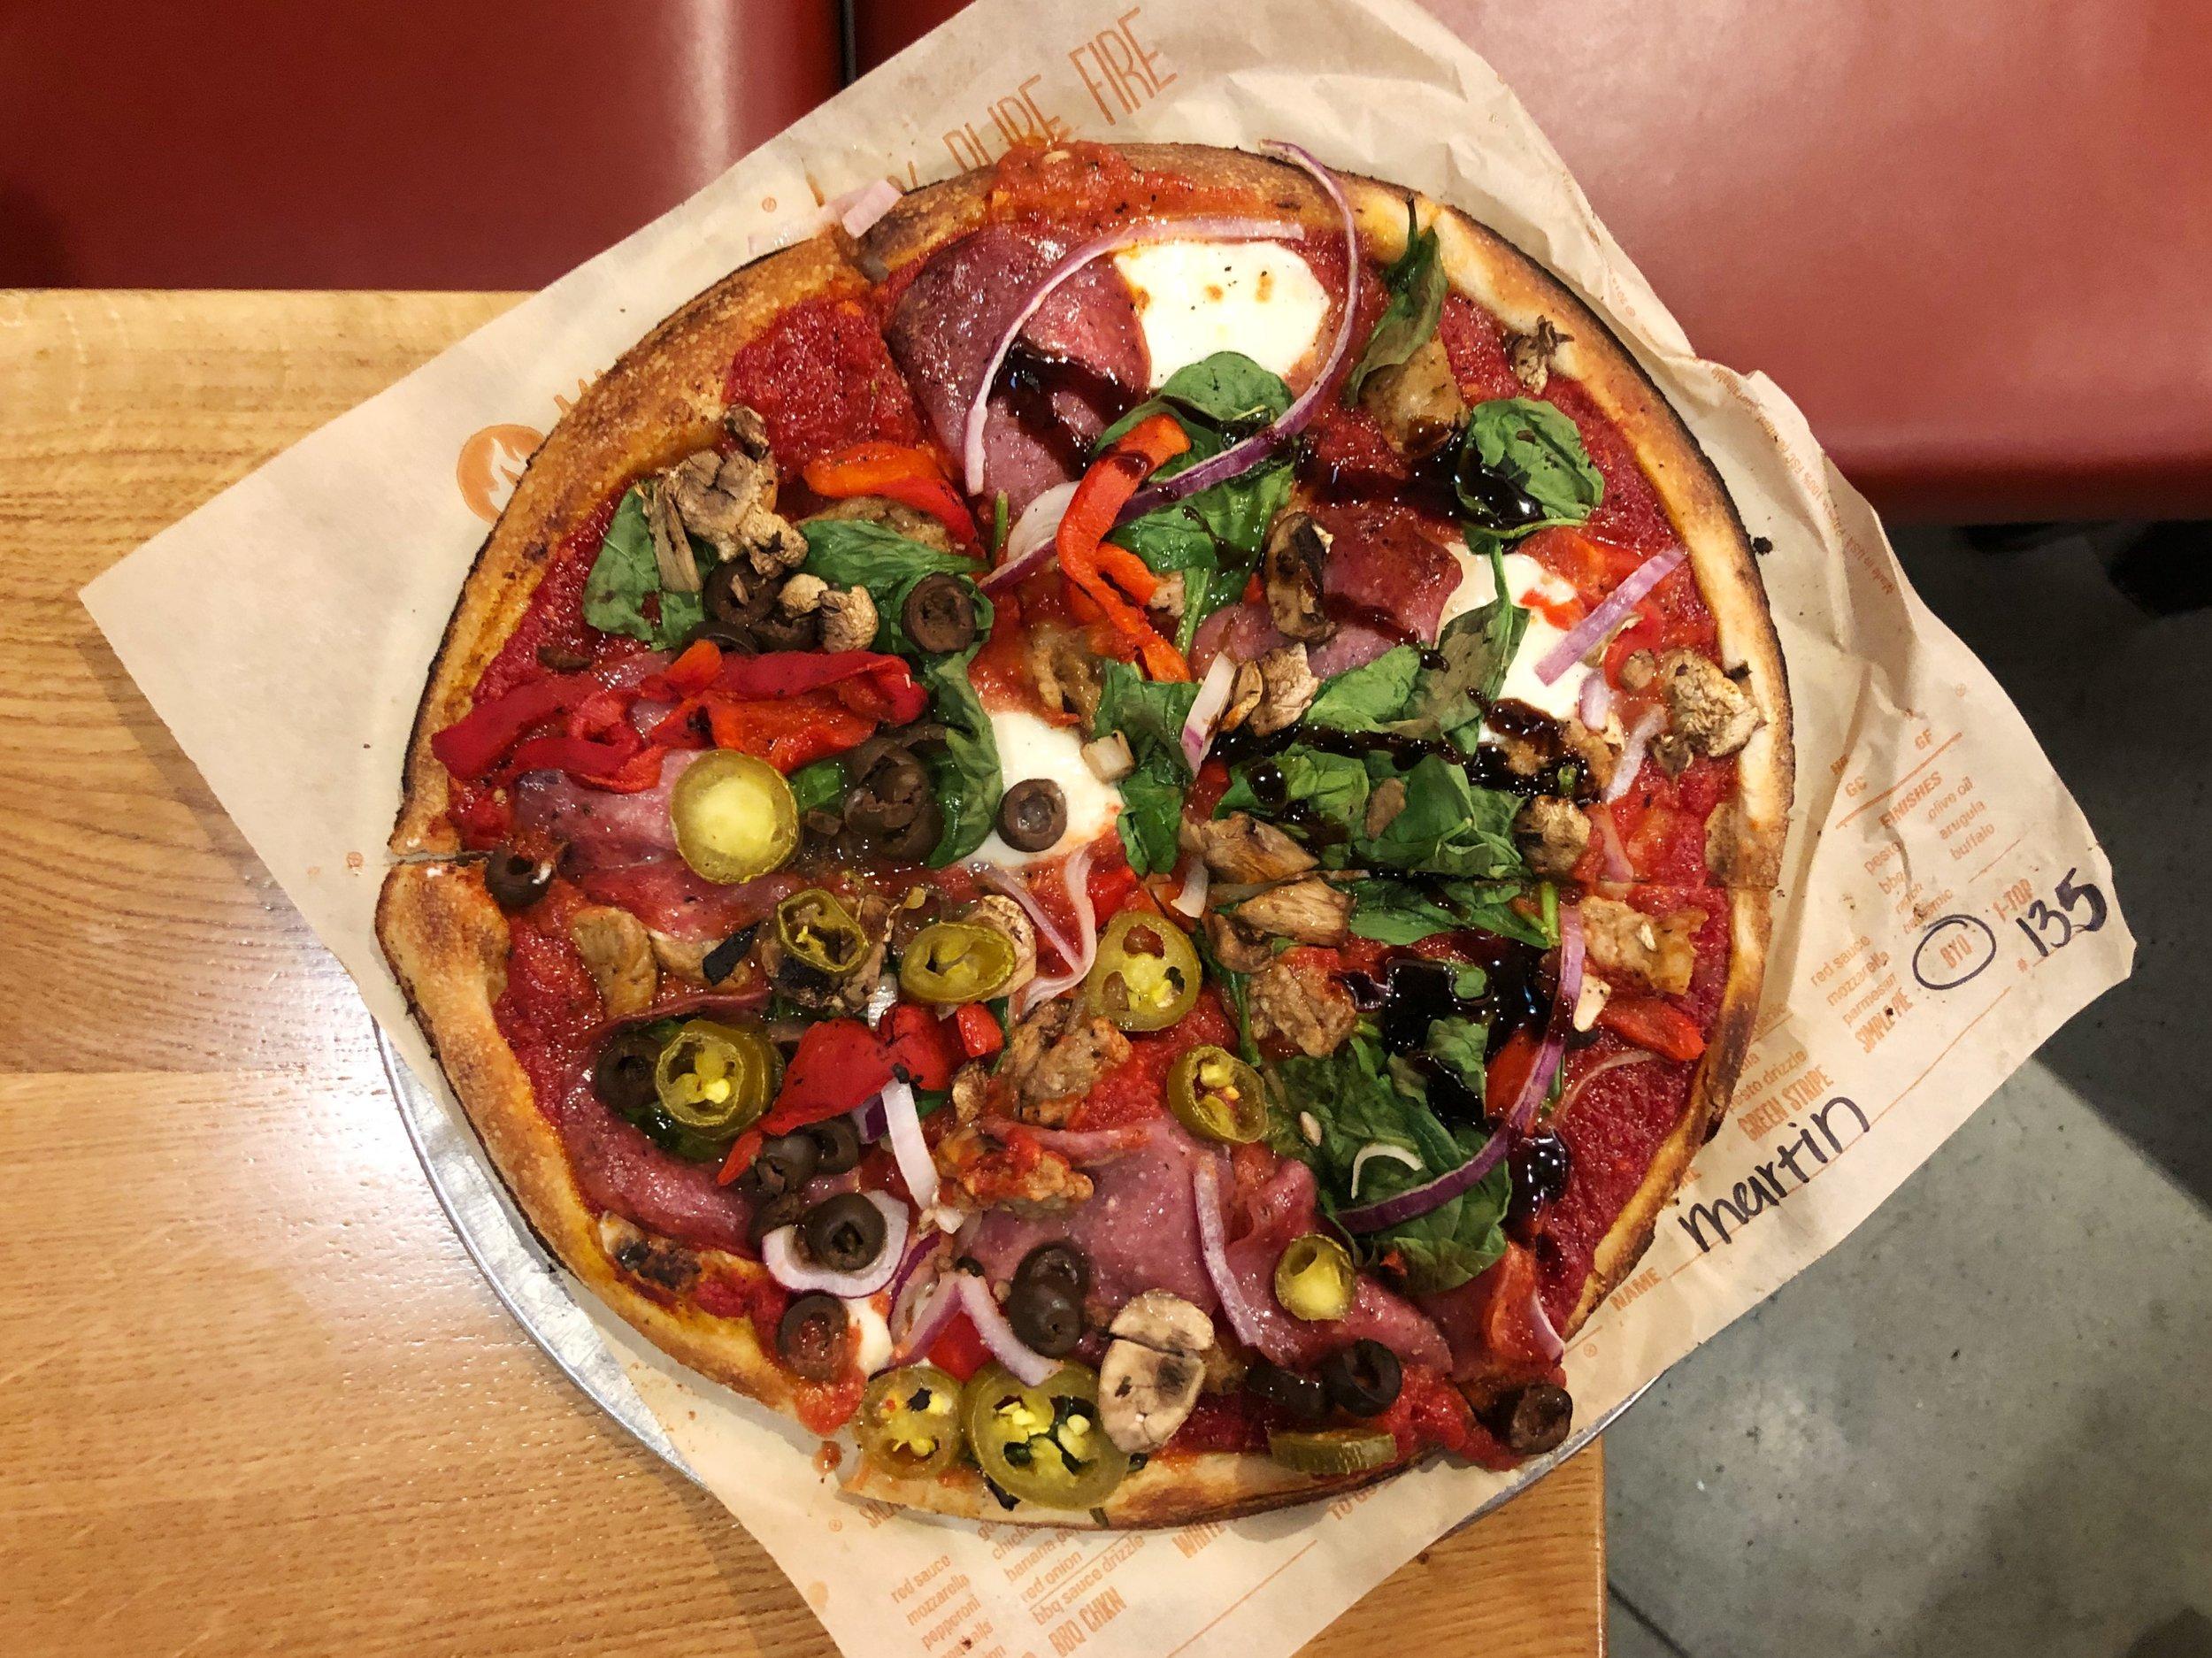 blaze-pizza-build-your-own